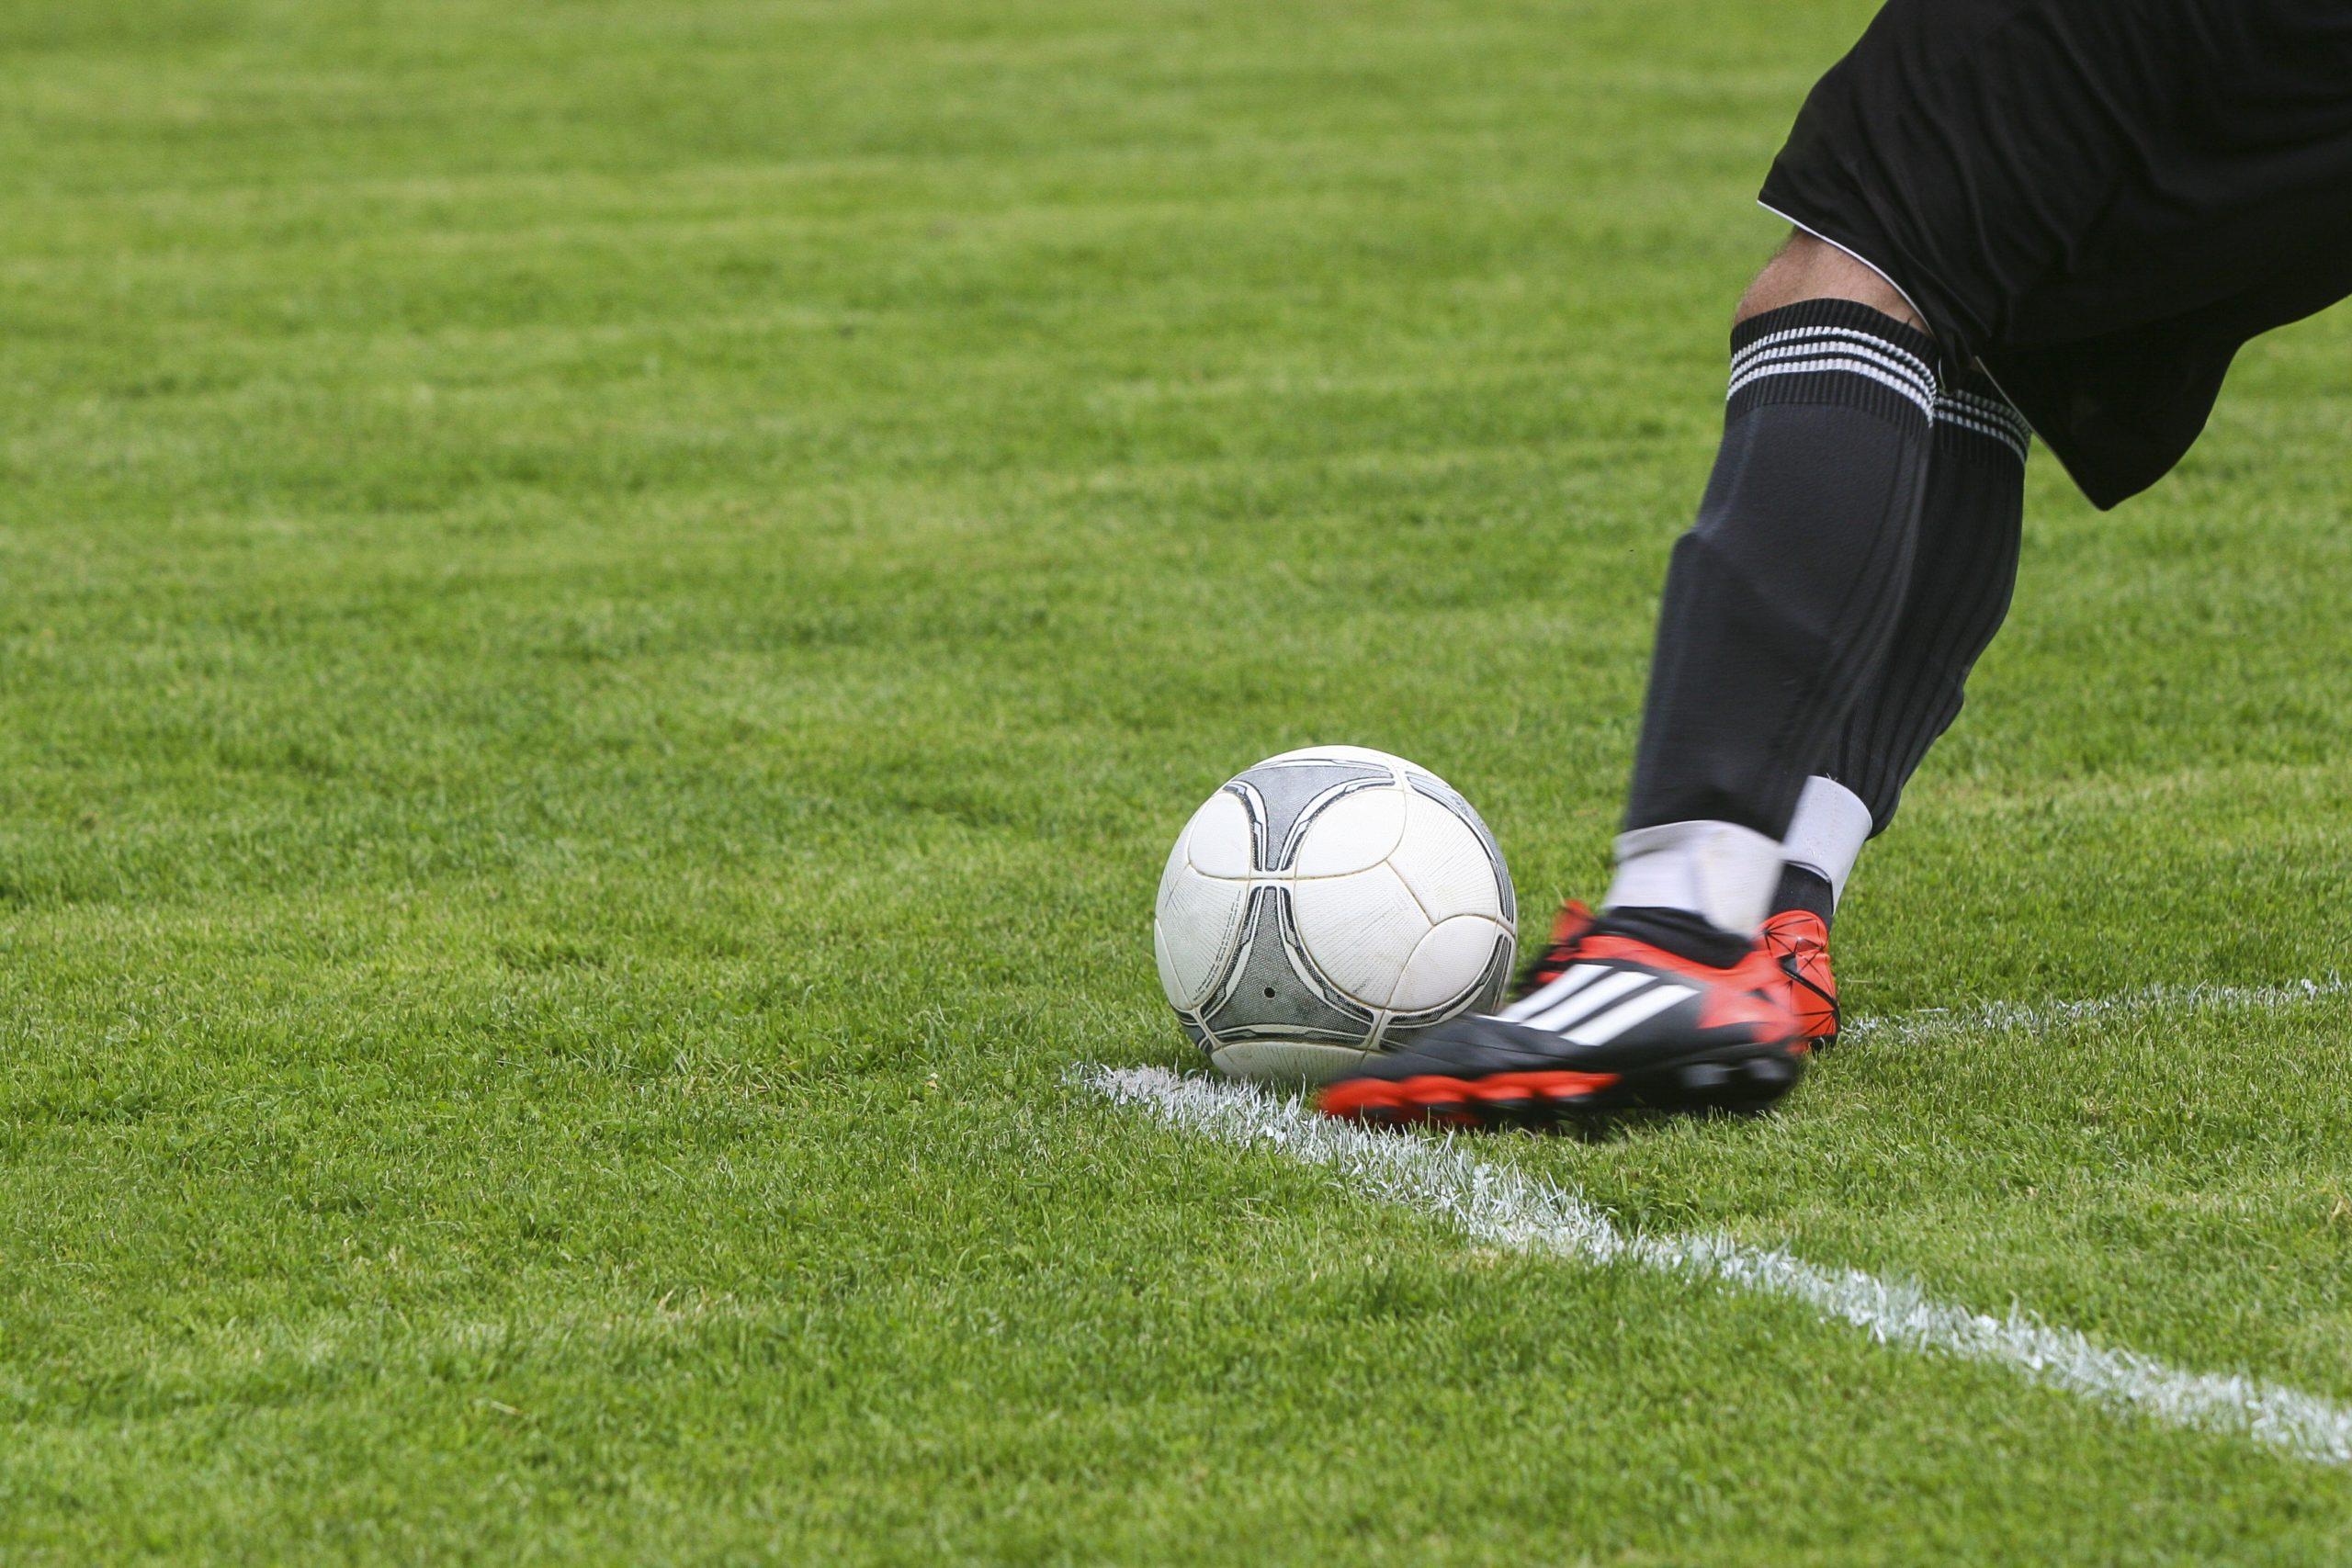 Hoe voorkom je voetbalblessures